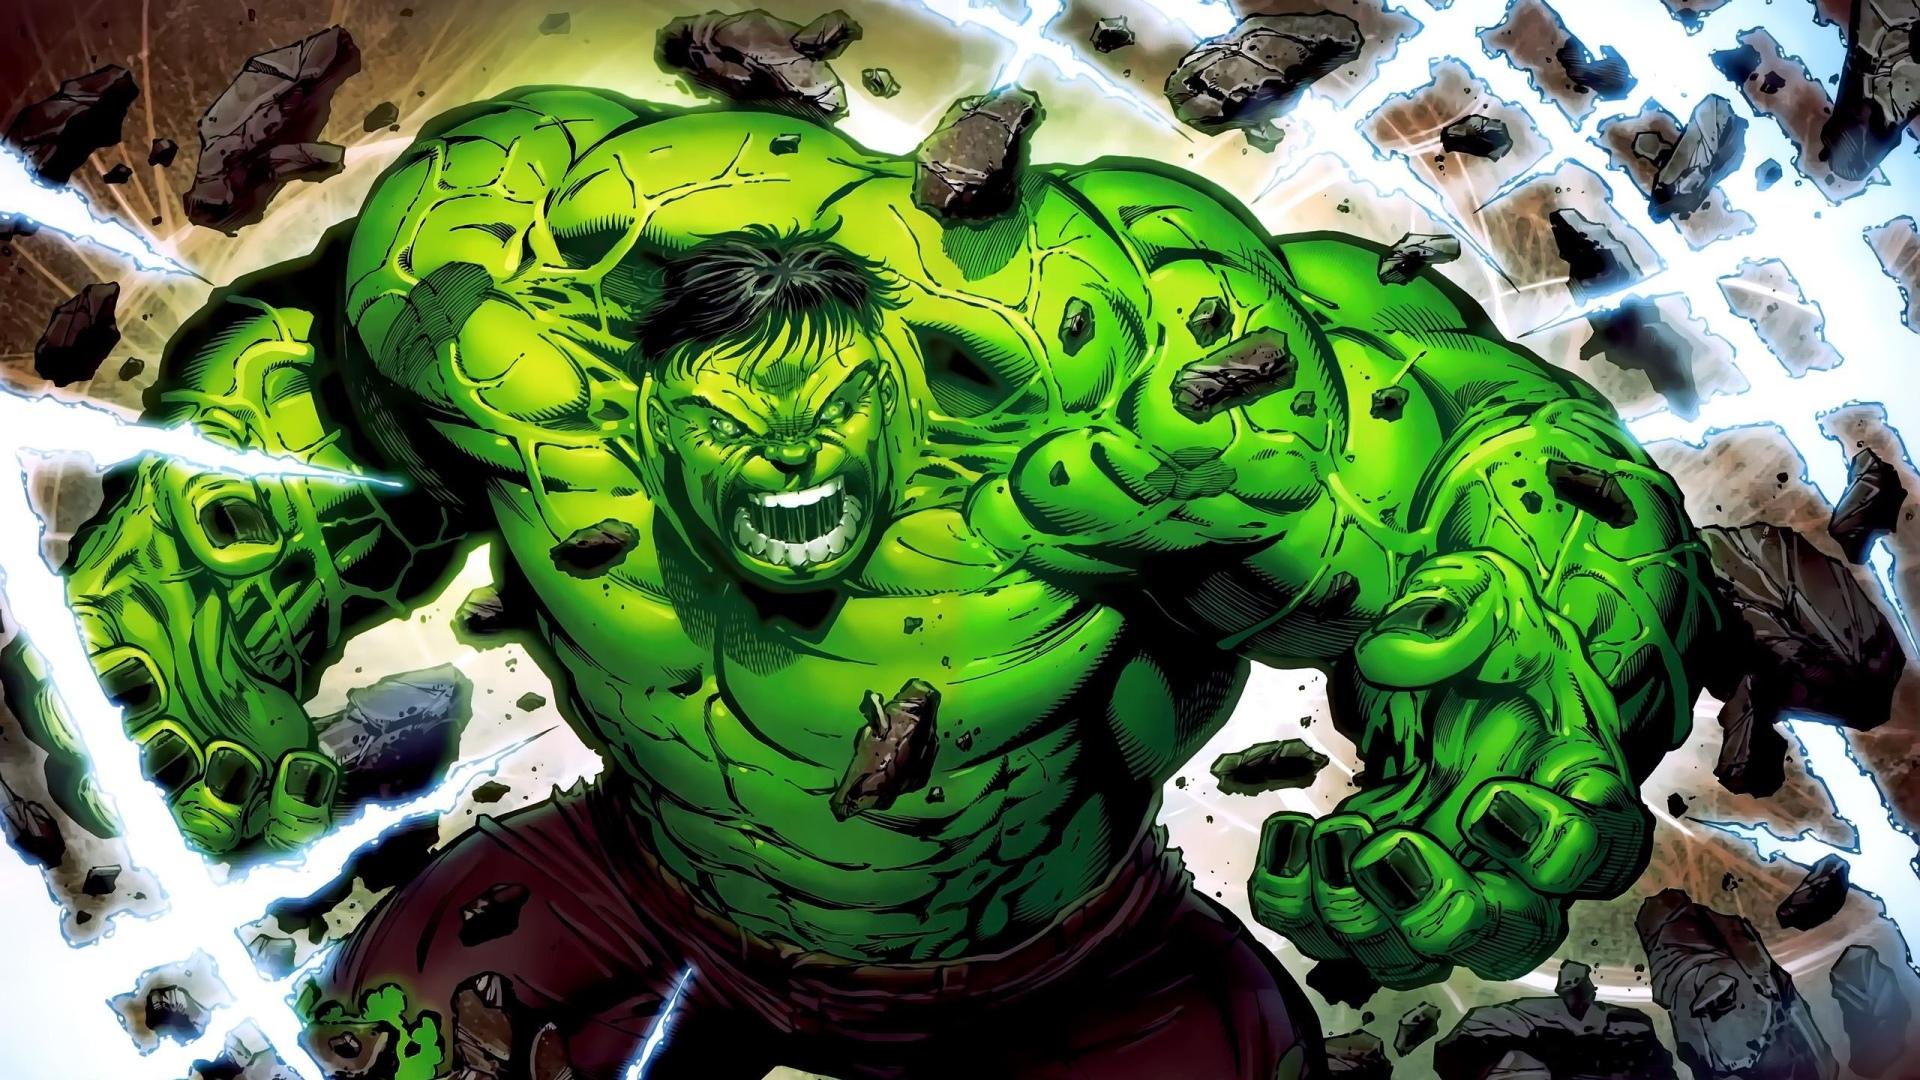 fondos de pantalla de hulk wallpapers hd gratis